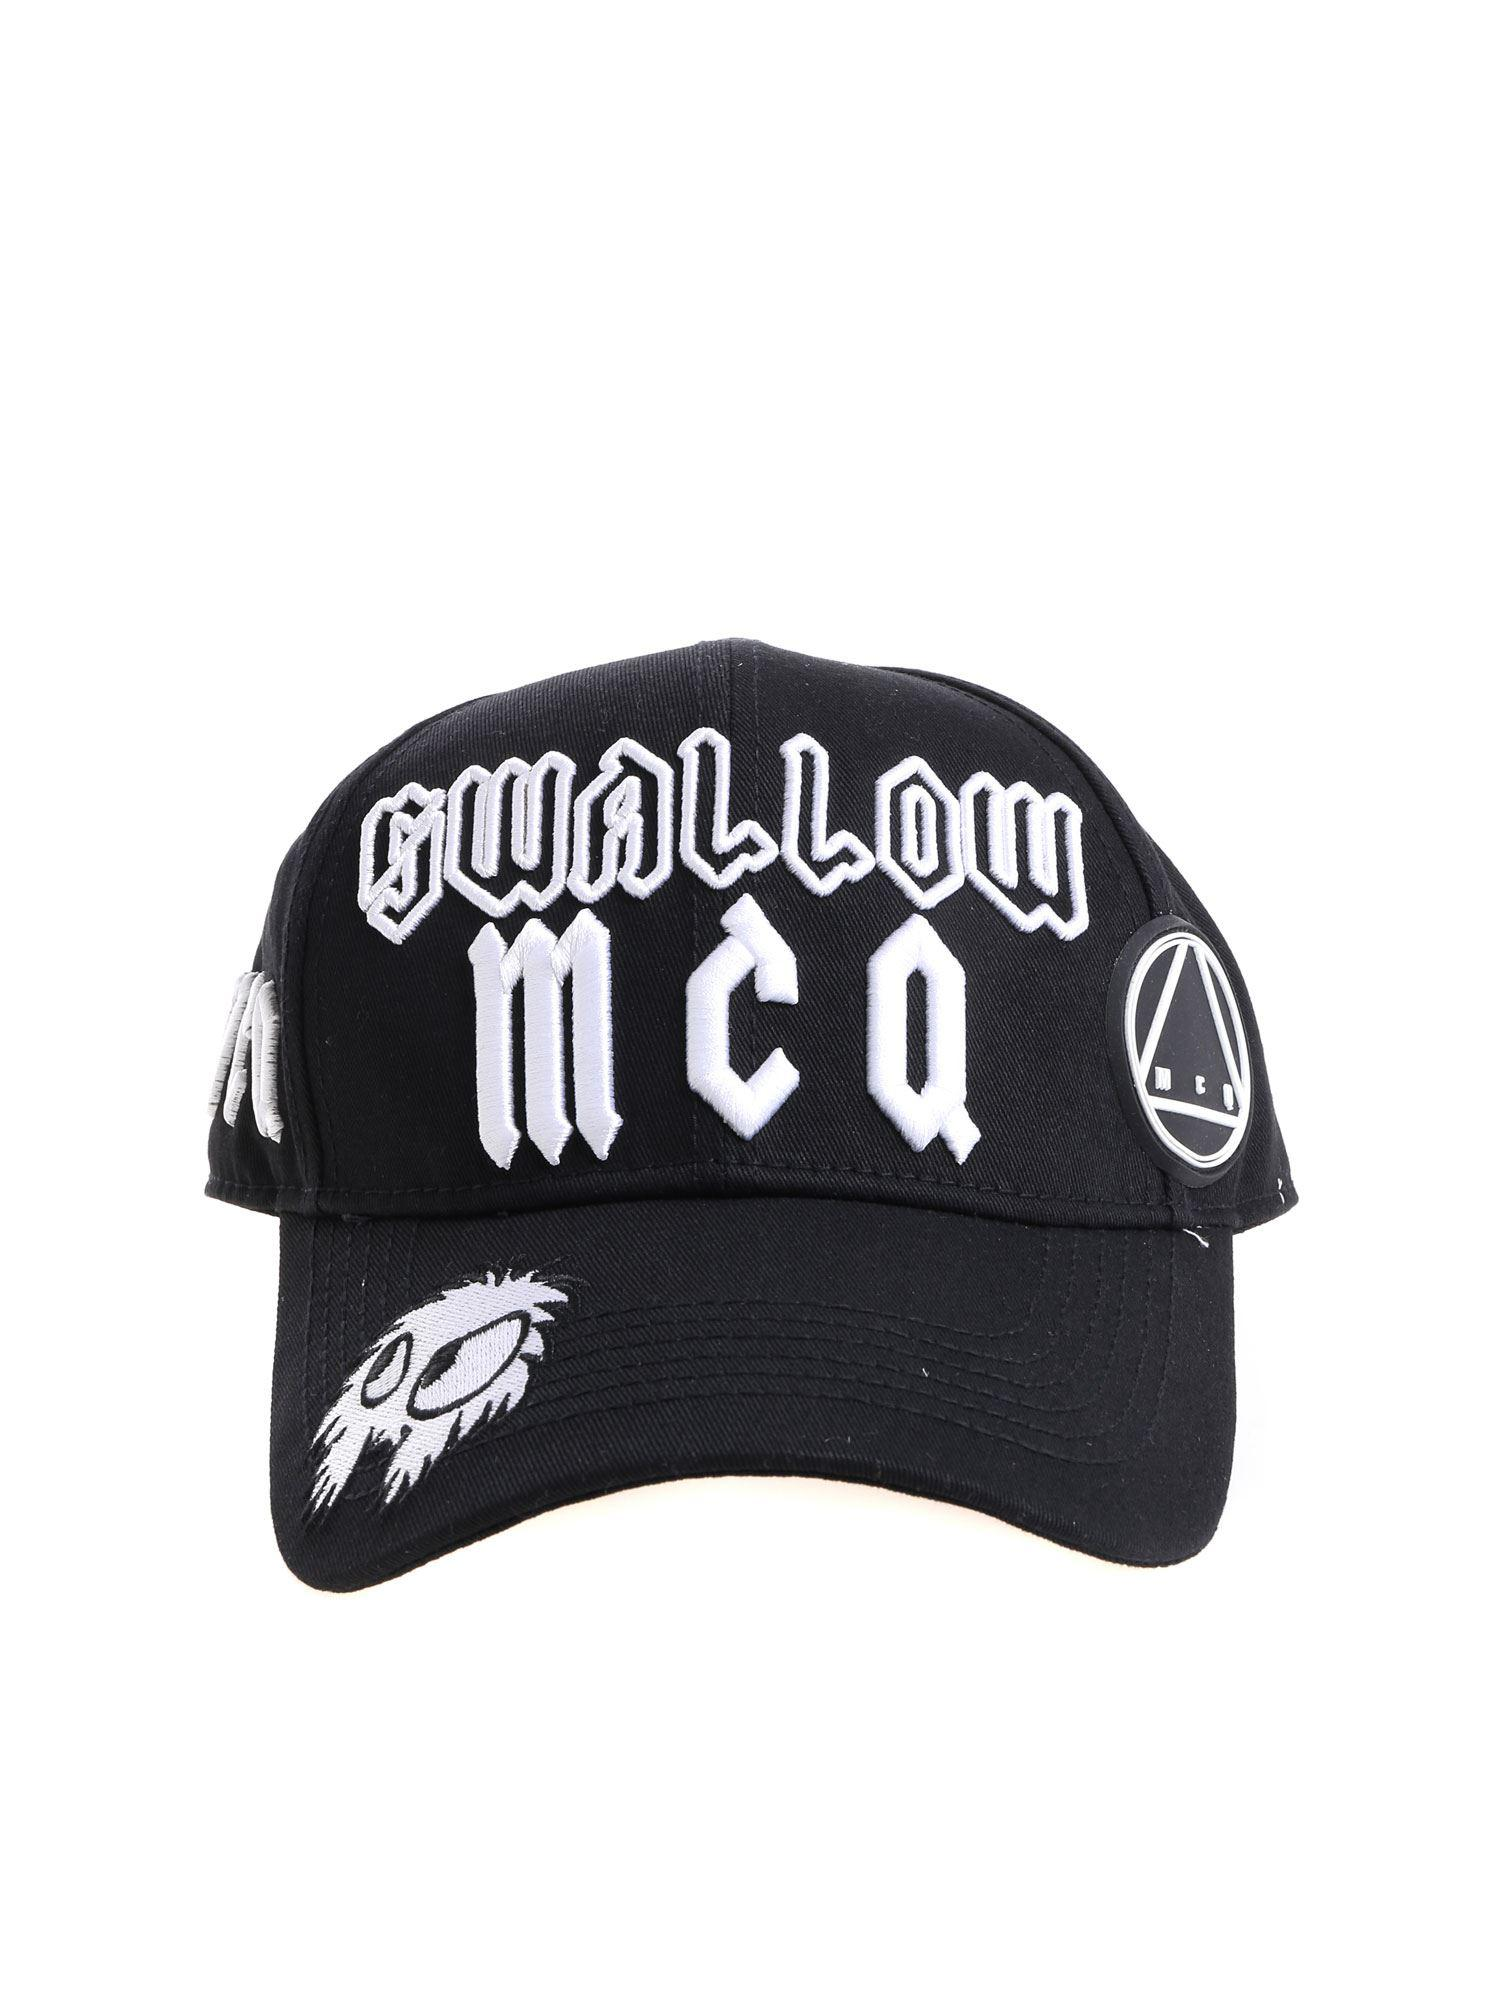 da9544f0e743ba Alexander McQueen Black Baseball Cap With Logo in Black for Men - Lyst